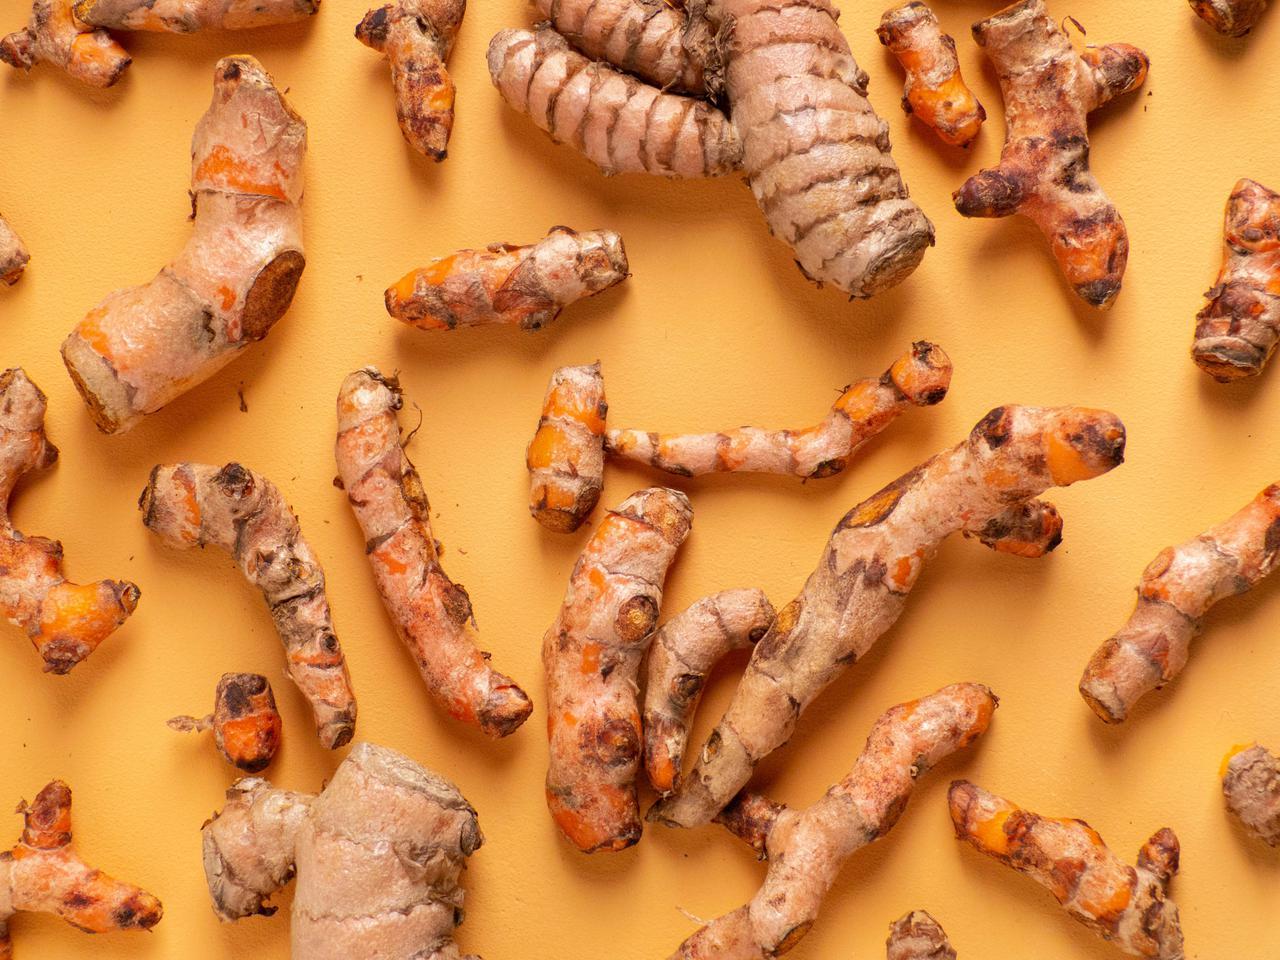 foodism360-wnkdaao2rvw-unsplash.jpg